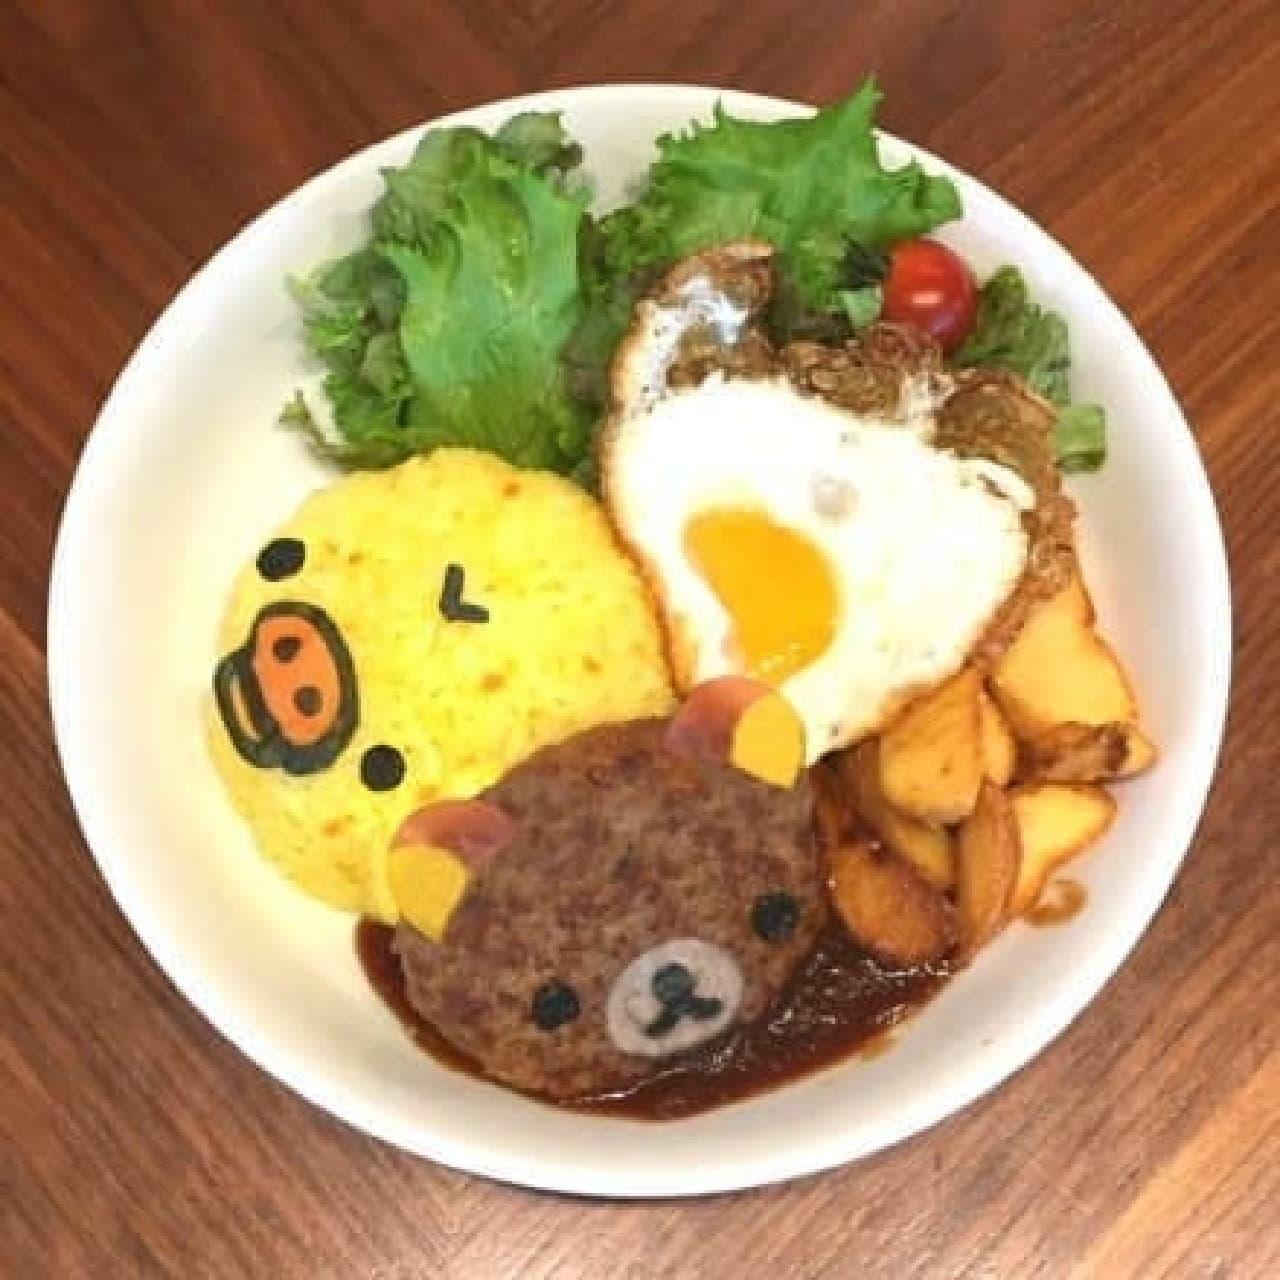 RILAKKUMA×TOWER RECORDS CAFE「キイロイトリとリラックマののんびりロコモコ」「キイロイトリのカツ丼」